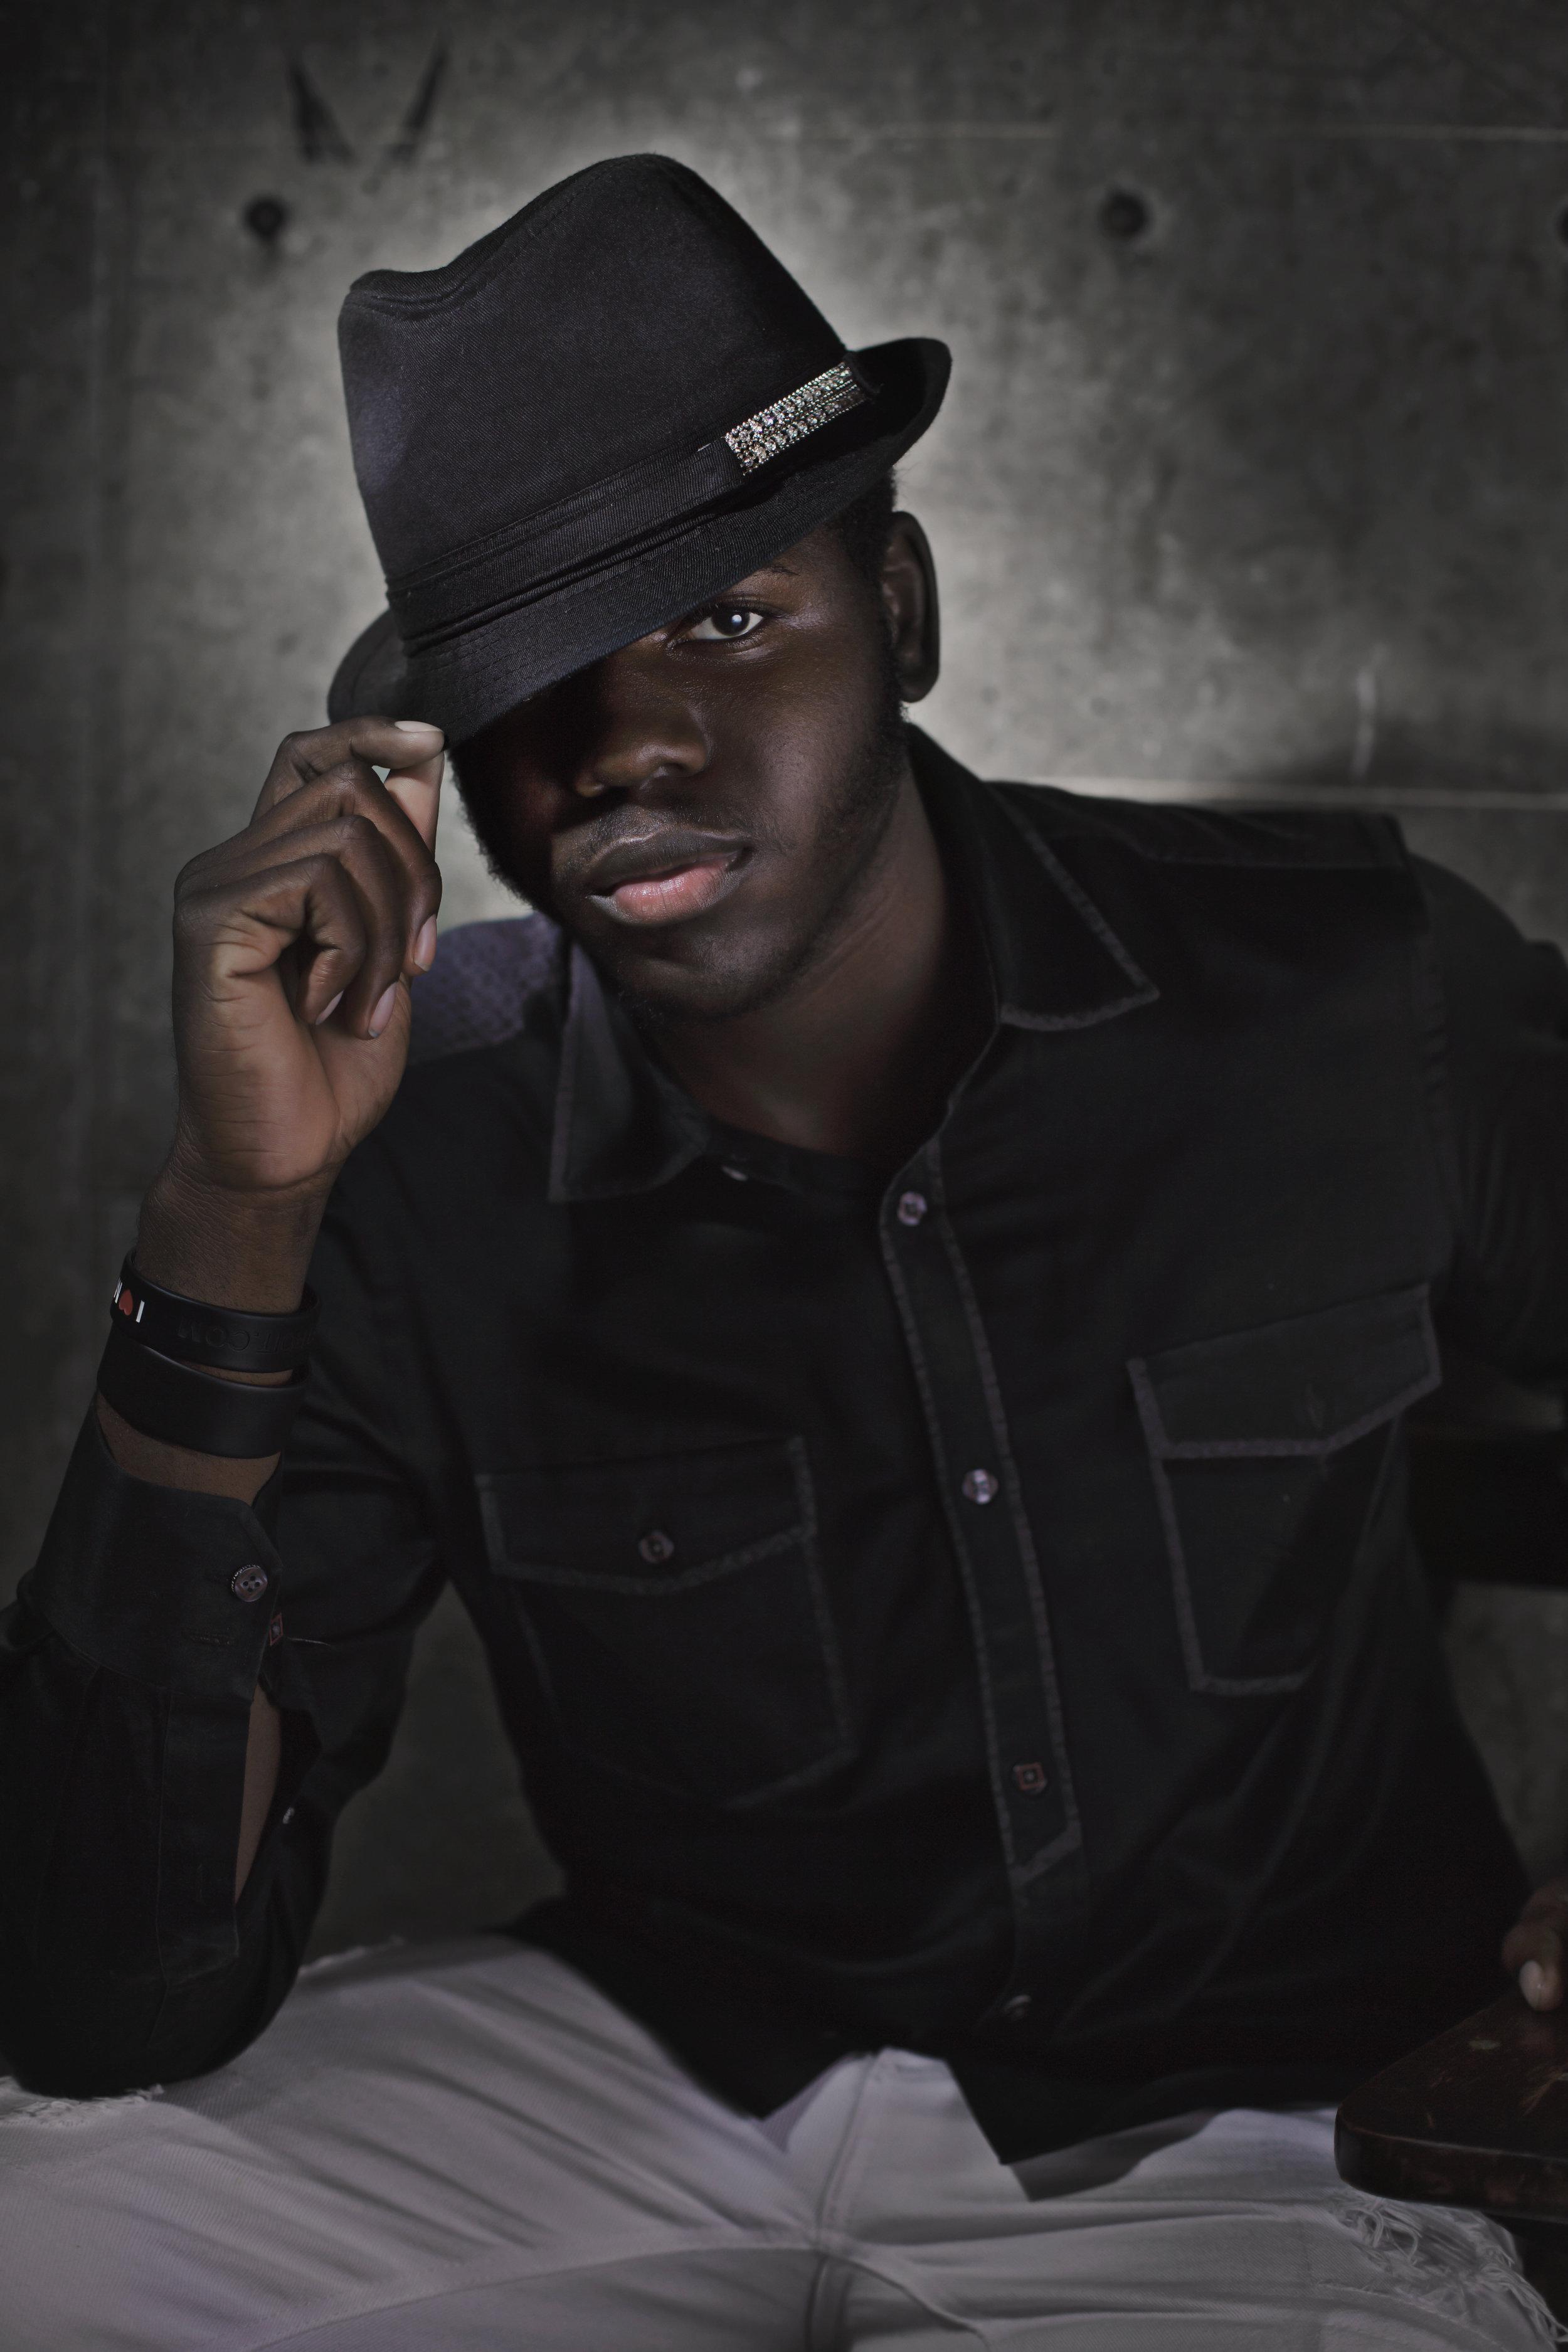 Melvin Johnson, high school student,aspiring entertainer.